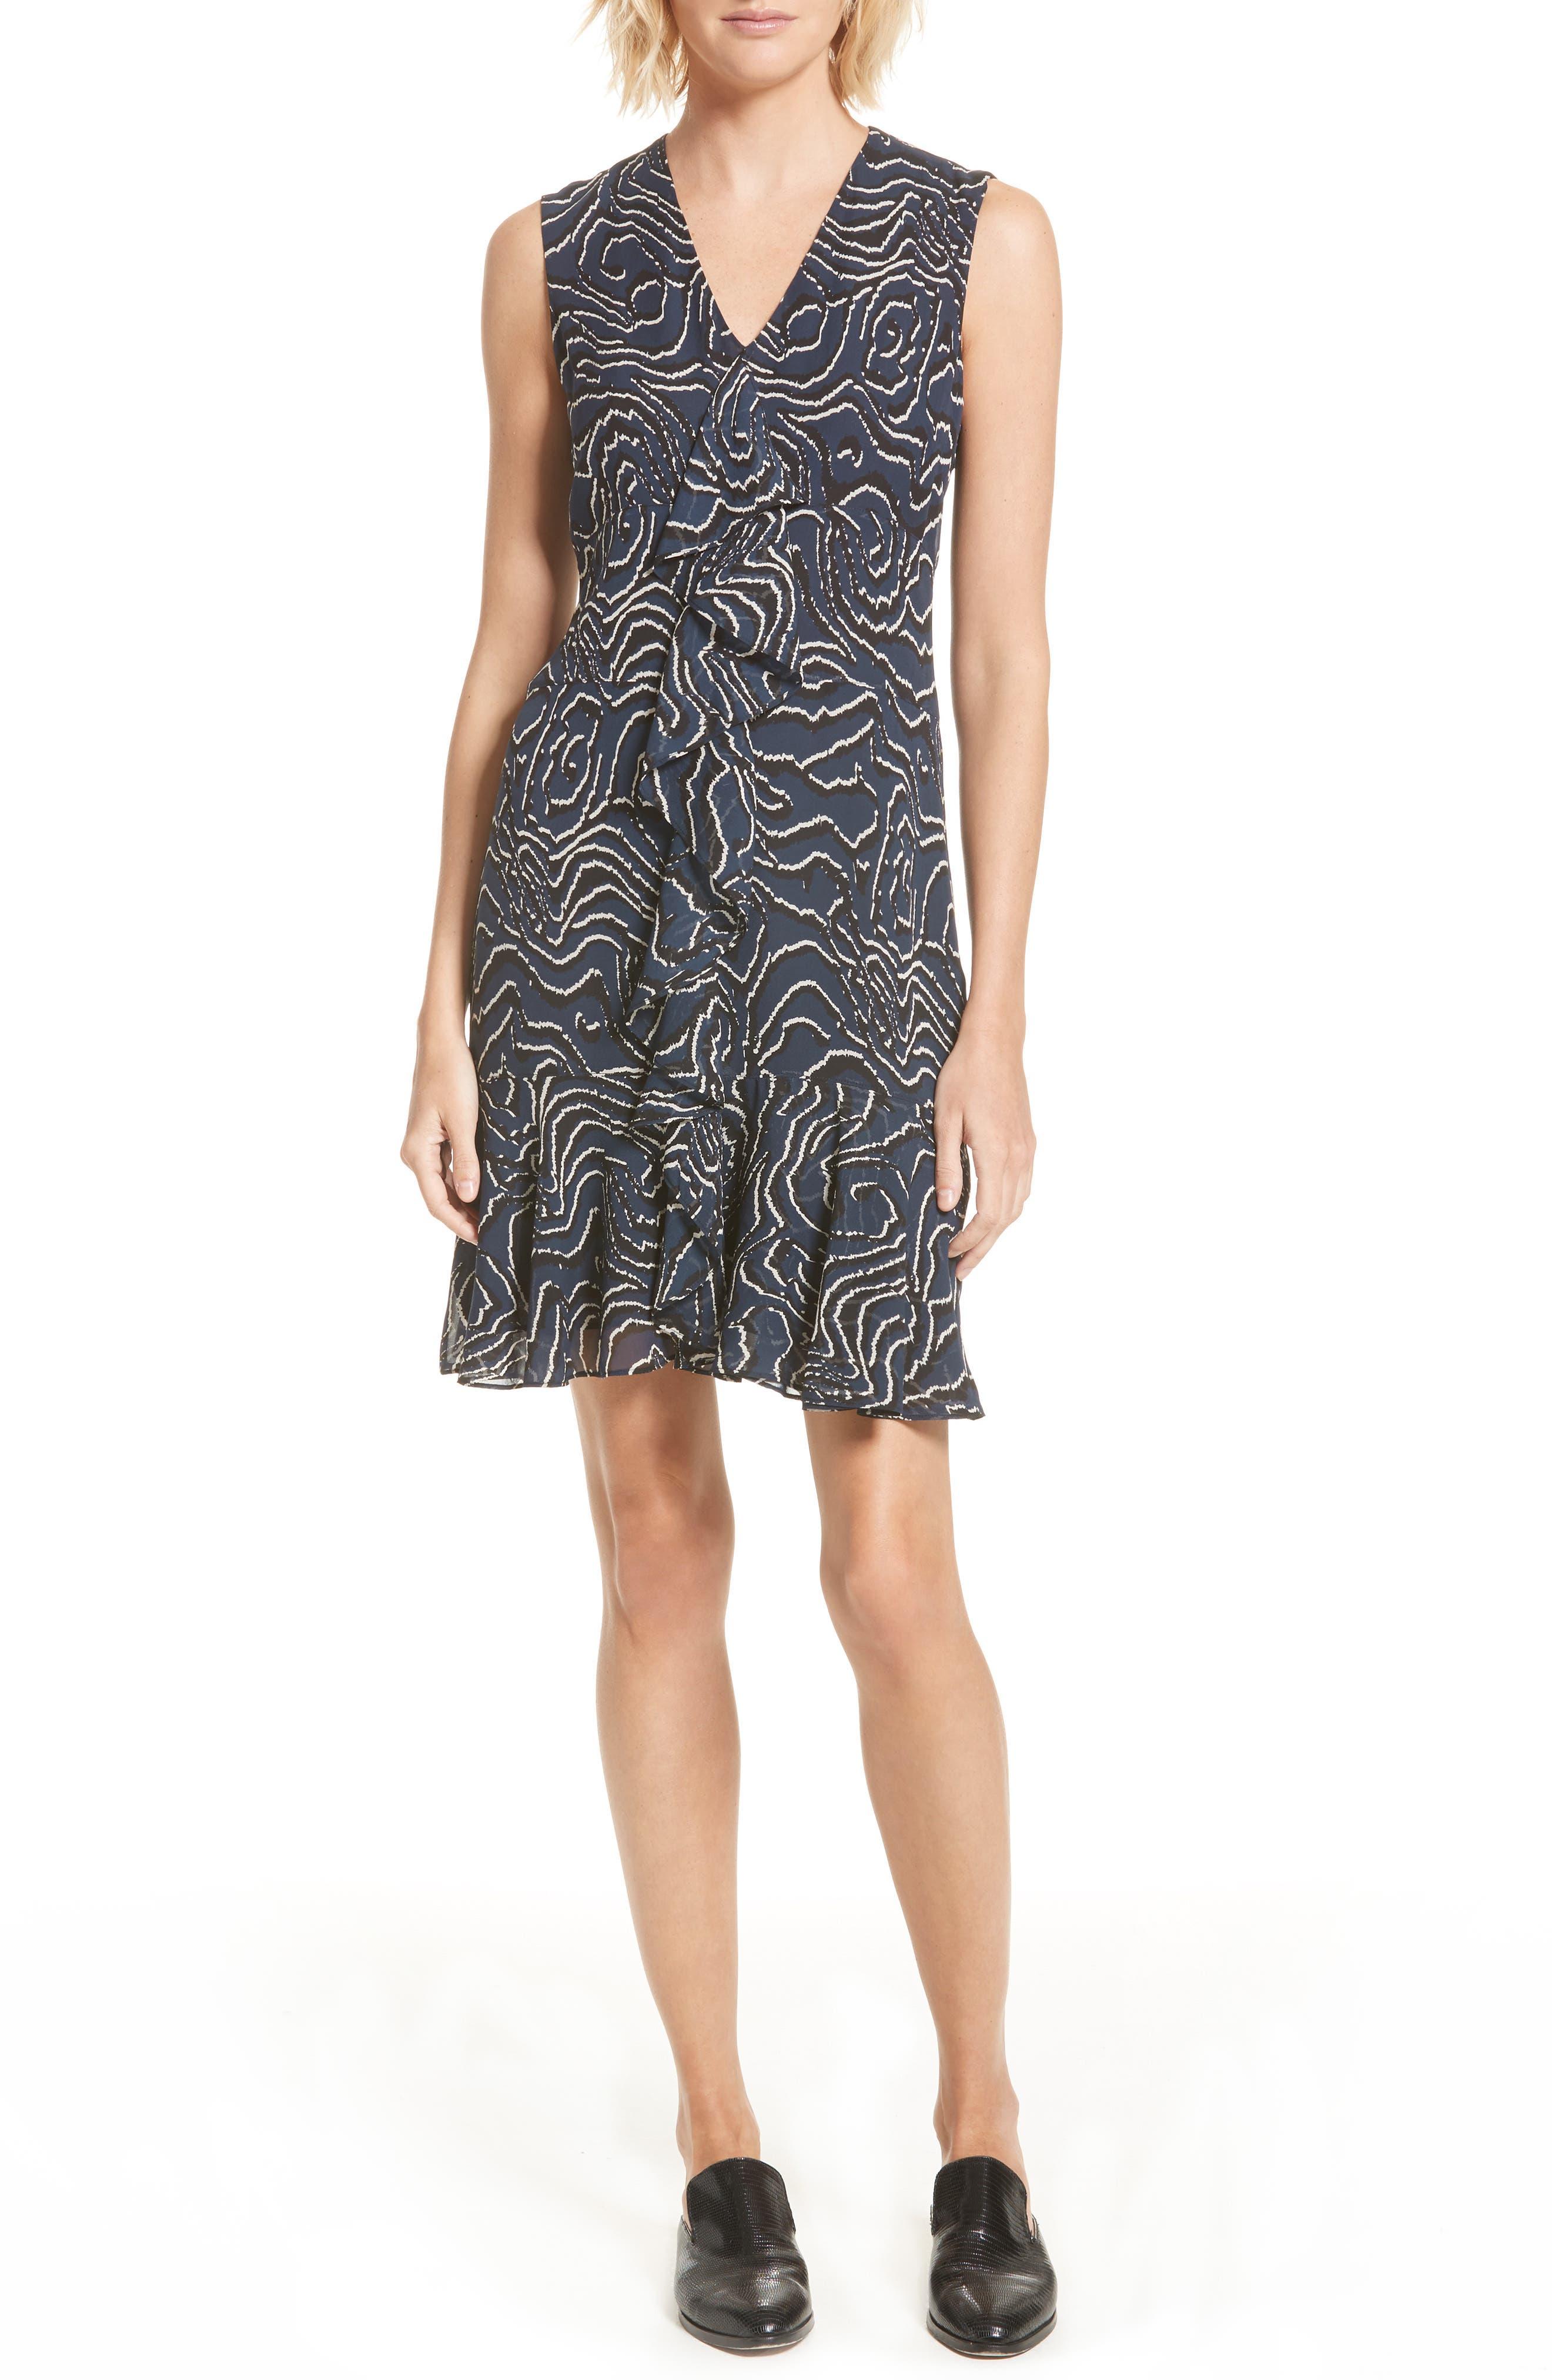 Derek Lam 10 Crosby Ruffle Print Silk Dress